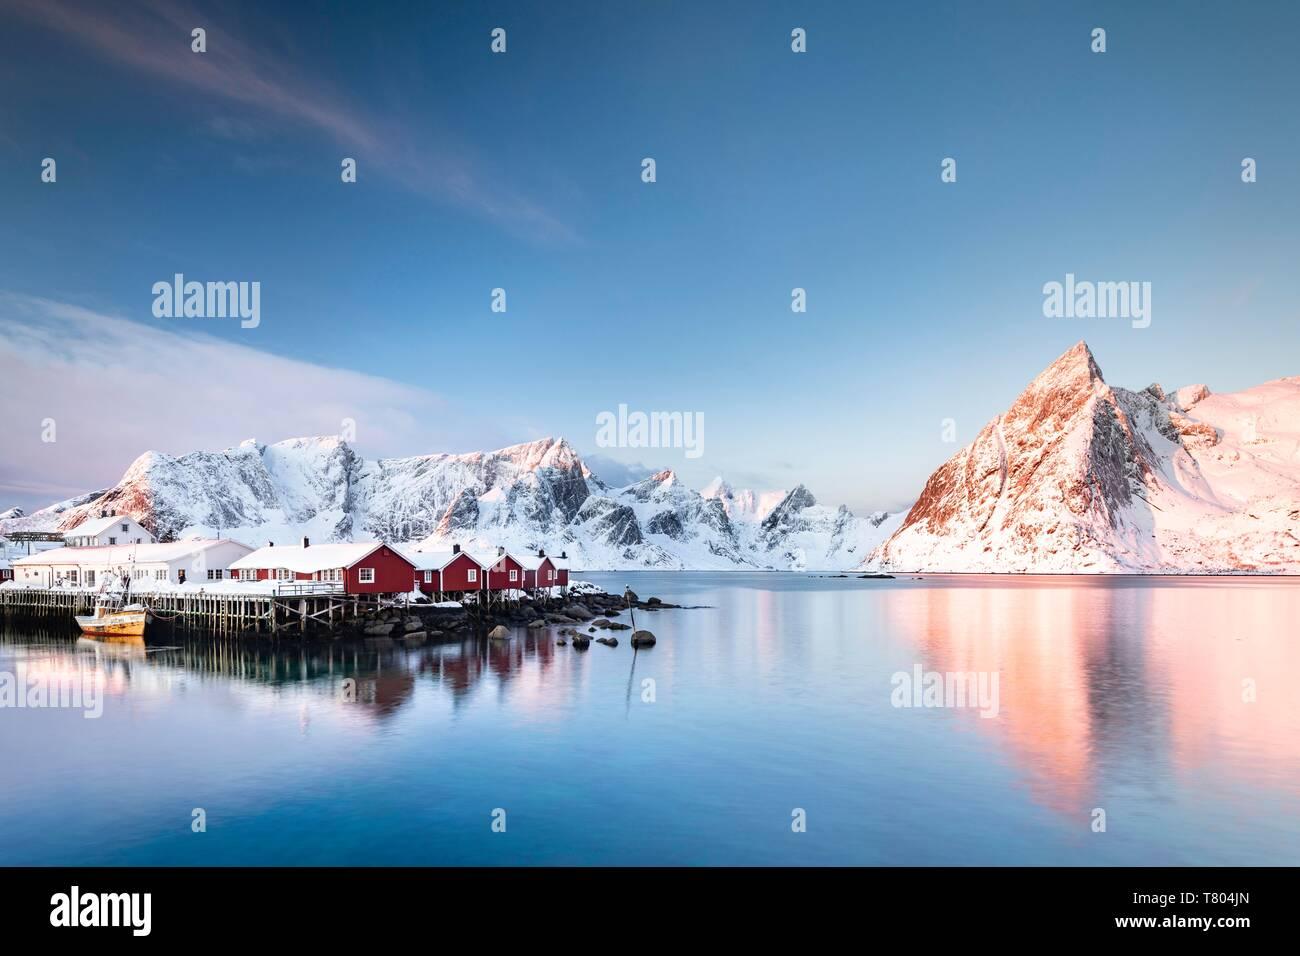 Rorbuer huts of Hamnoy at sunrise, behind snow-covered mountains, Olstinden, Hamnoy, Moskenesoya, Lofoten, Norway - Stock Image